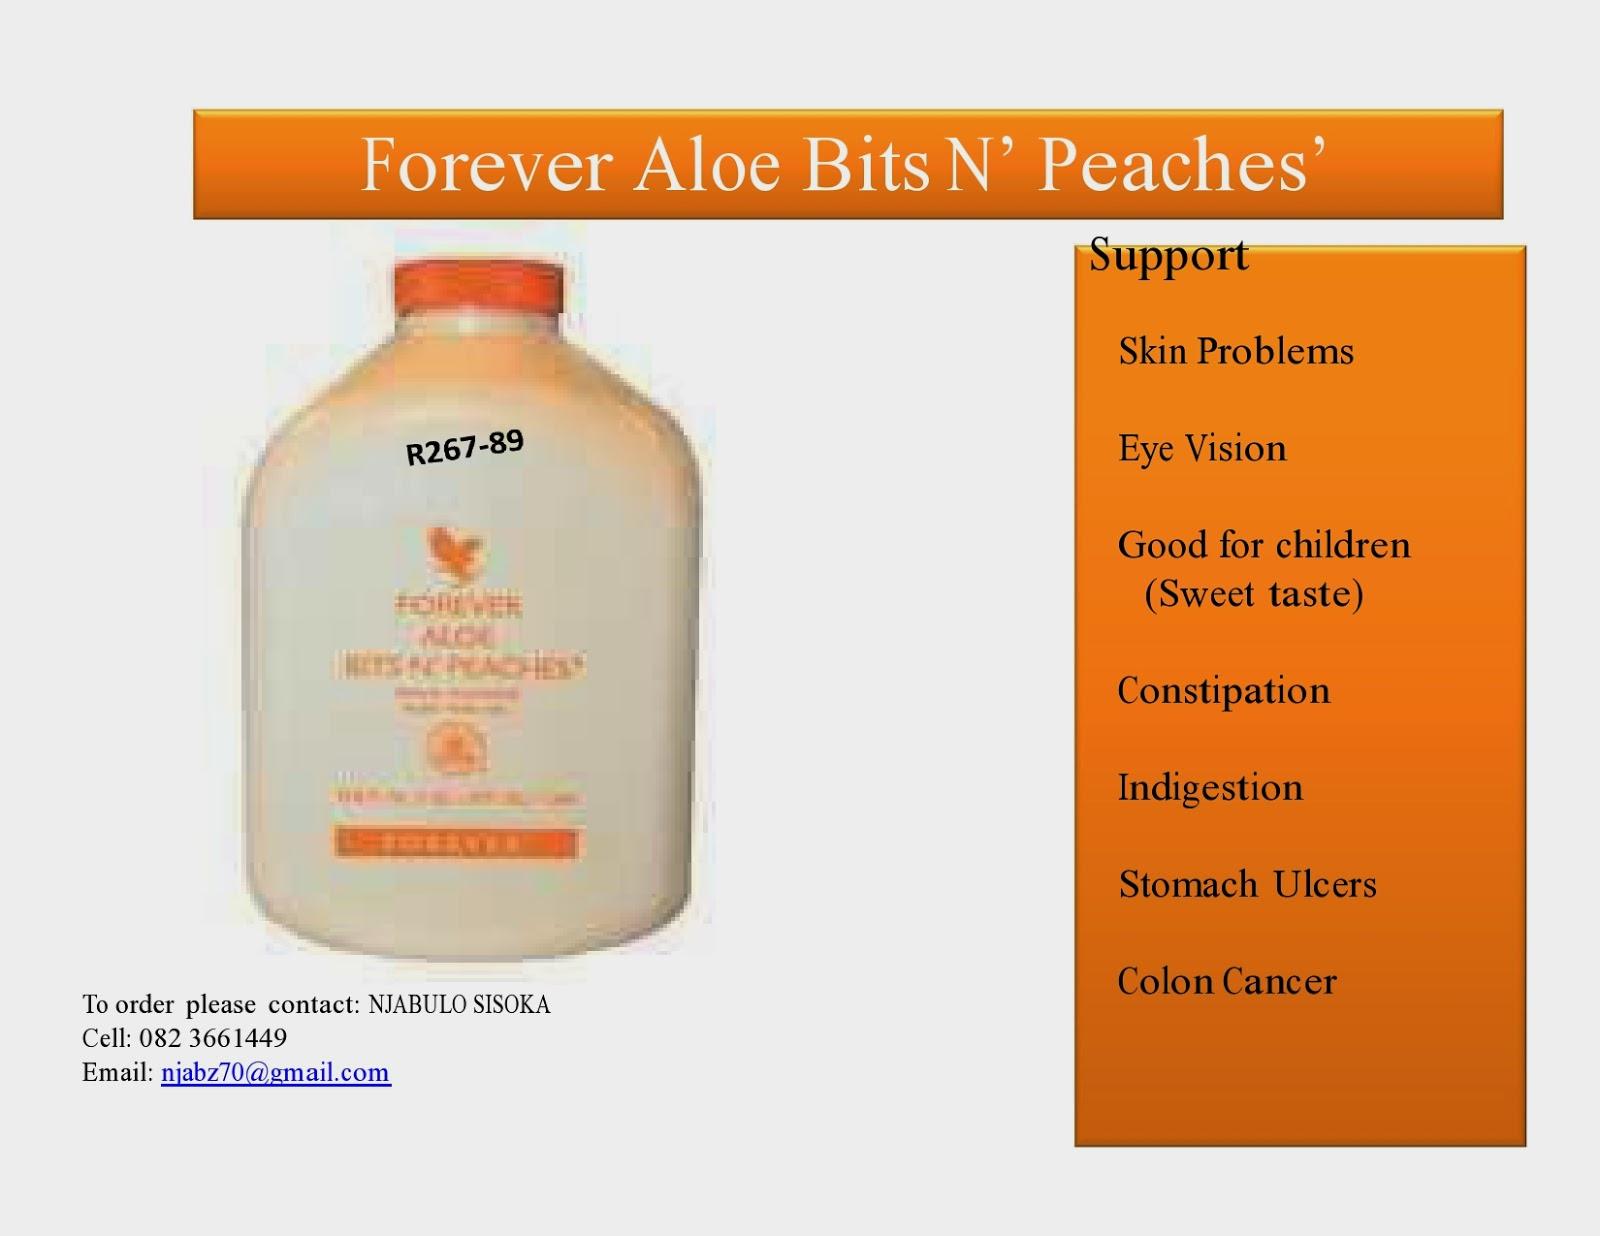 Aloe for wellness: Aloe for wellness